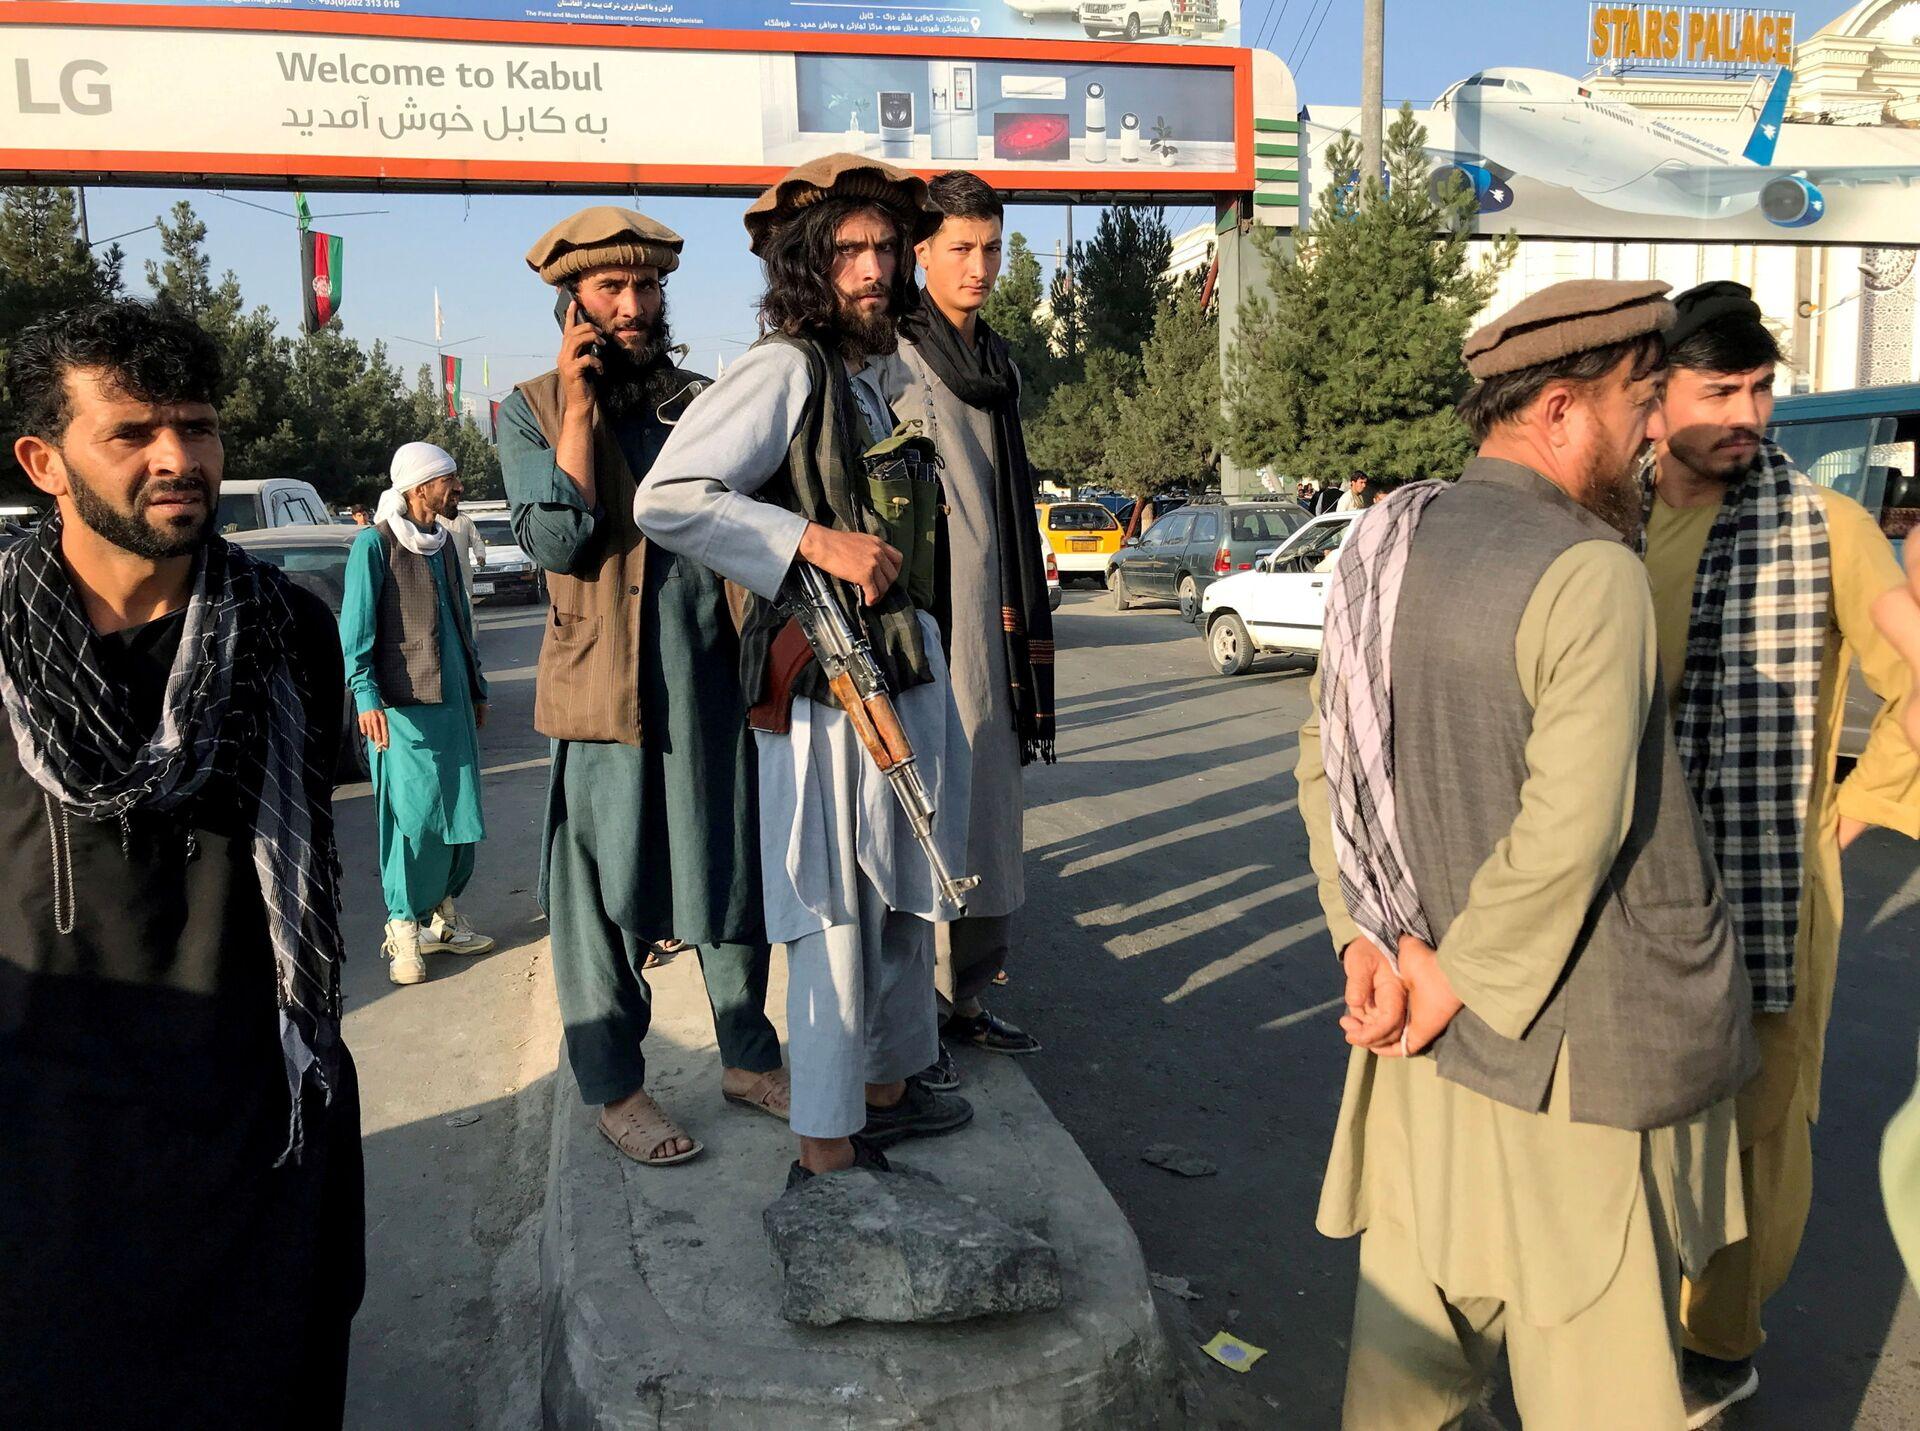 A member of Taliban (C) stands outside Hamid Karzai International Airport in Kabul, Afghanistan, August 16 - Sputnik International, 1920, 07.09.2021